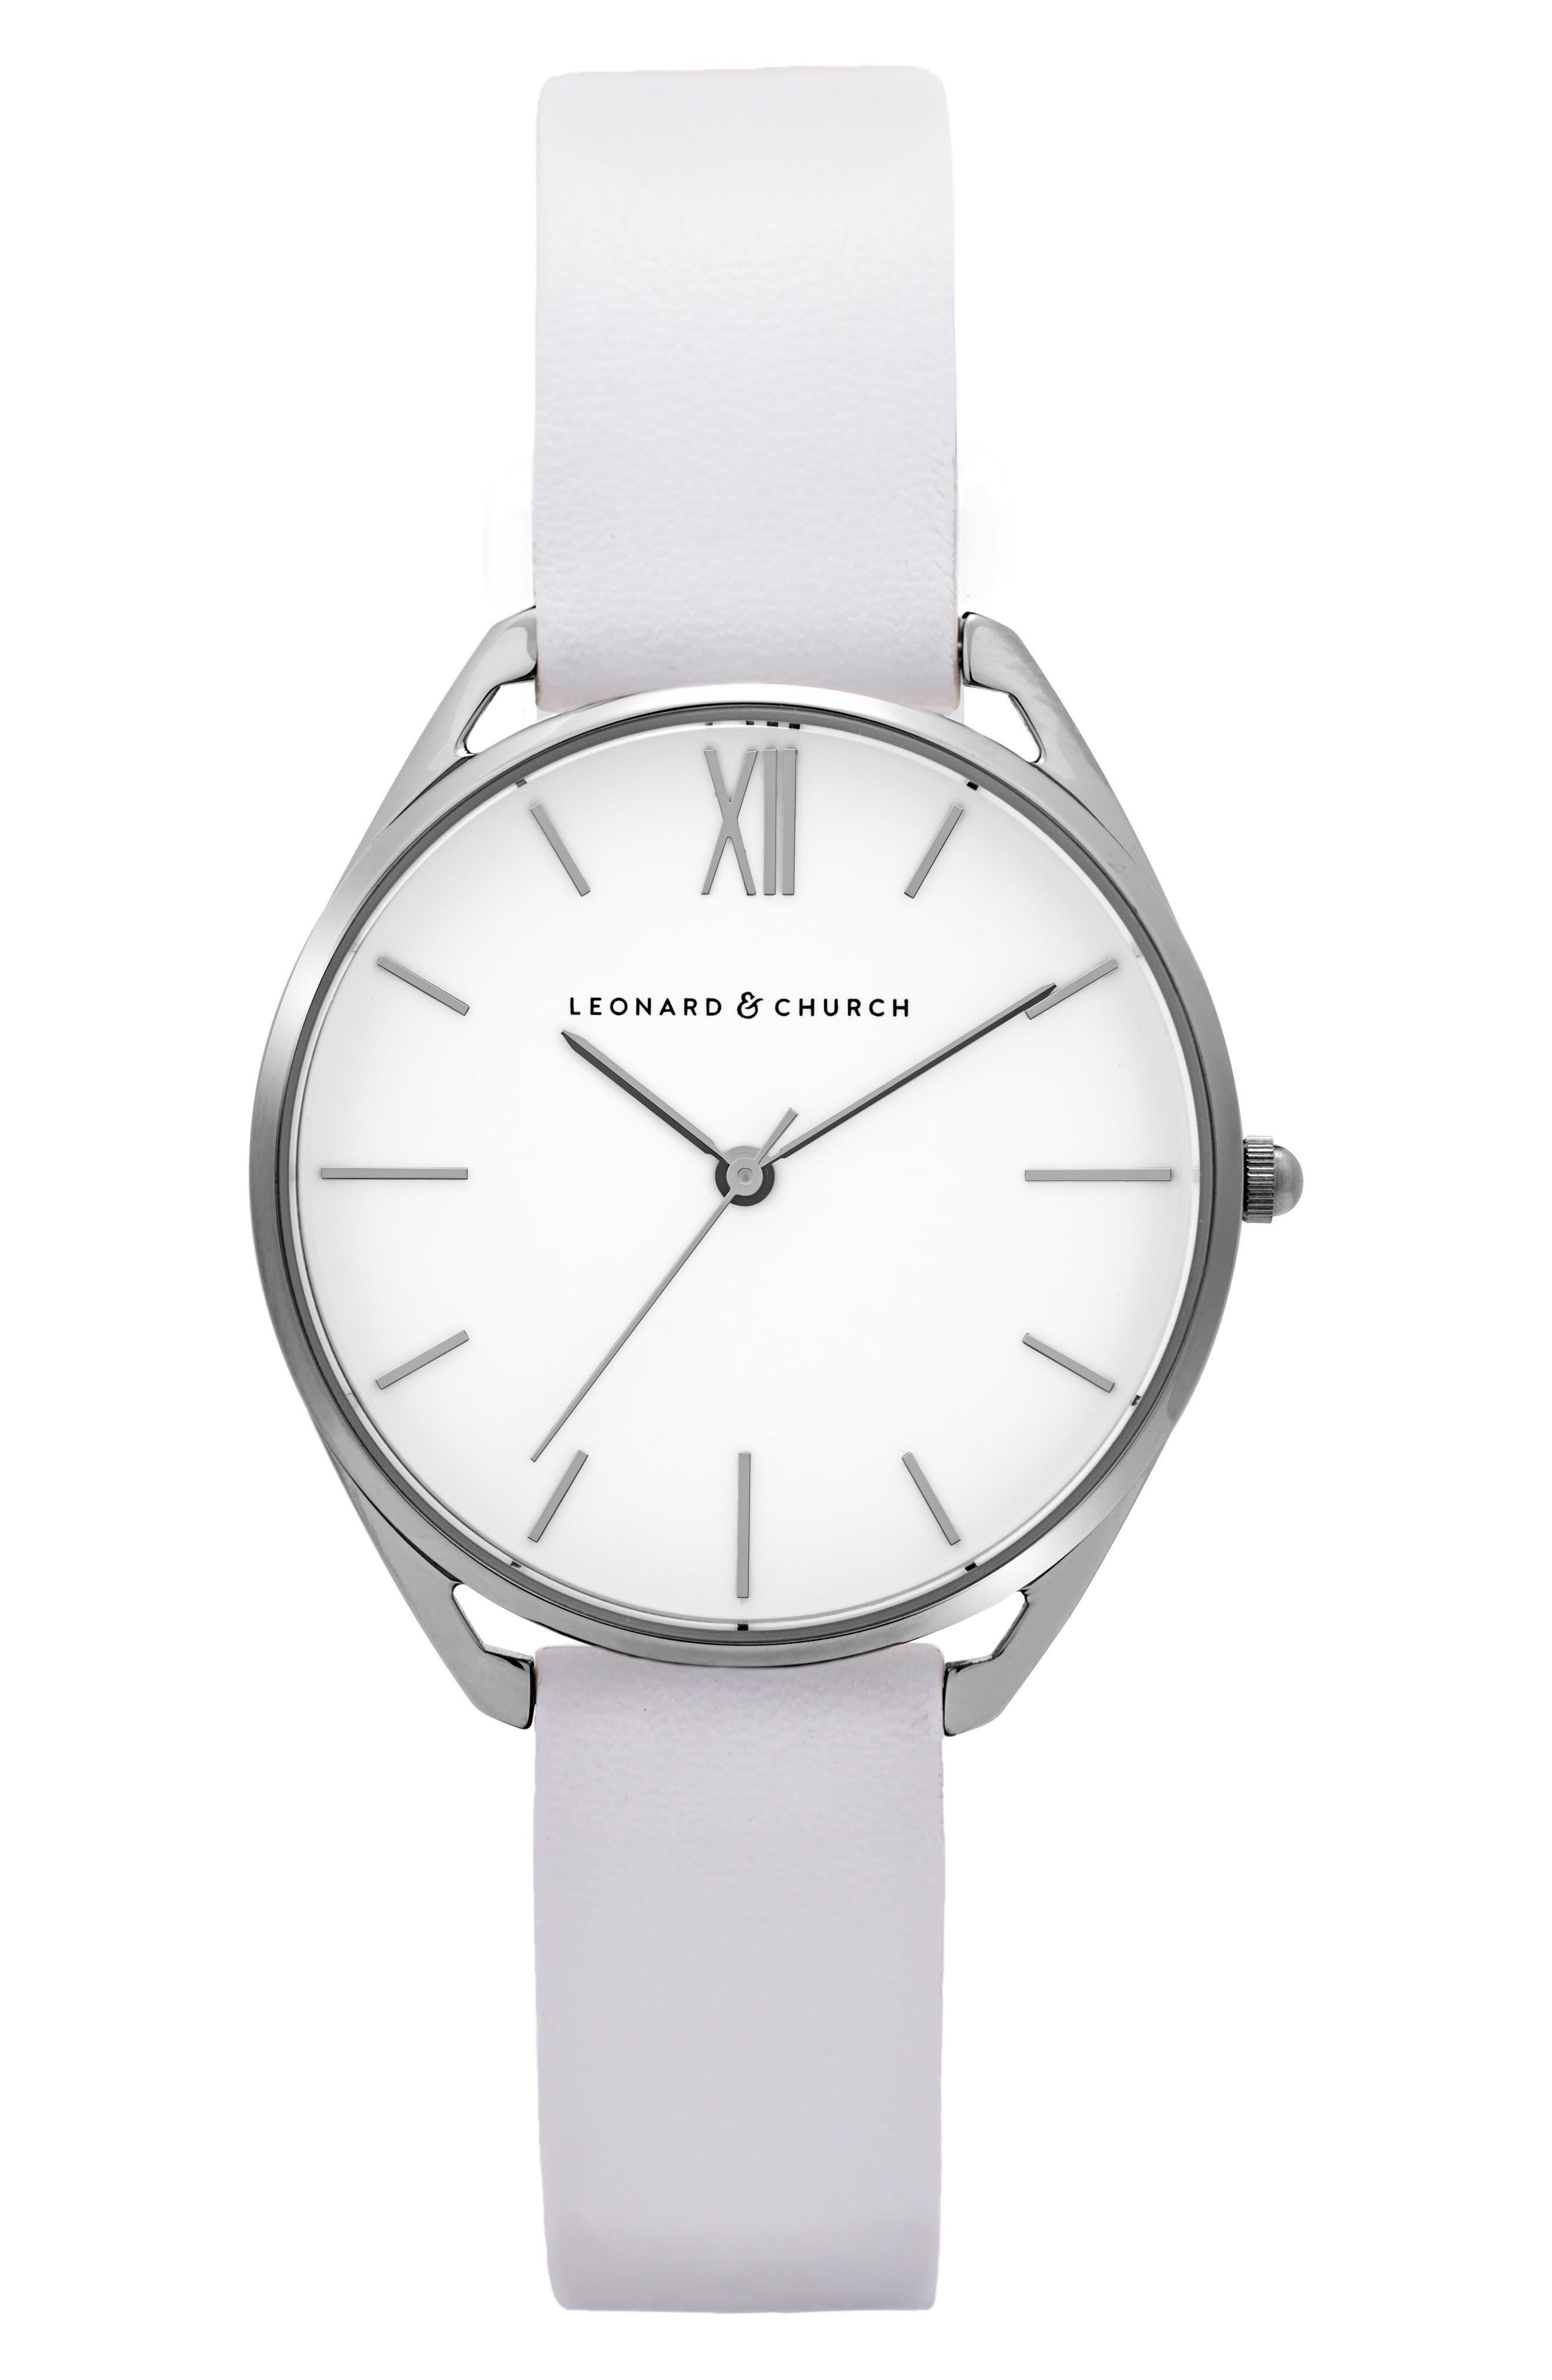 Leonard & Church Chelsea Leather Strap Watch, 34mm